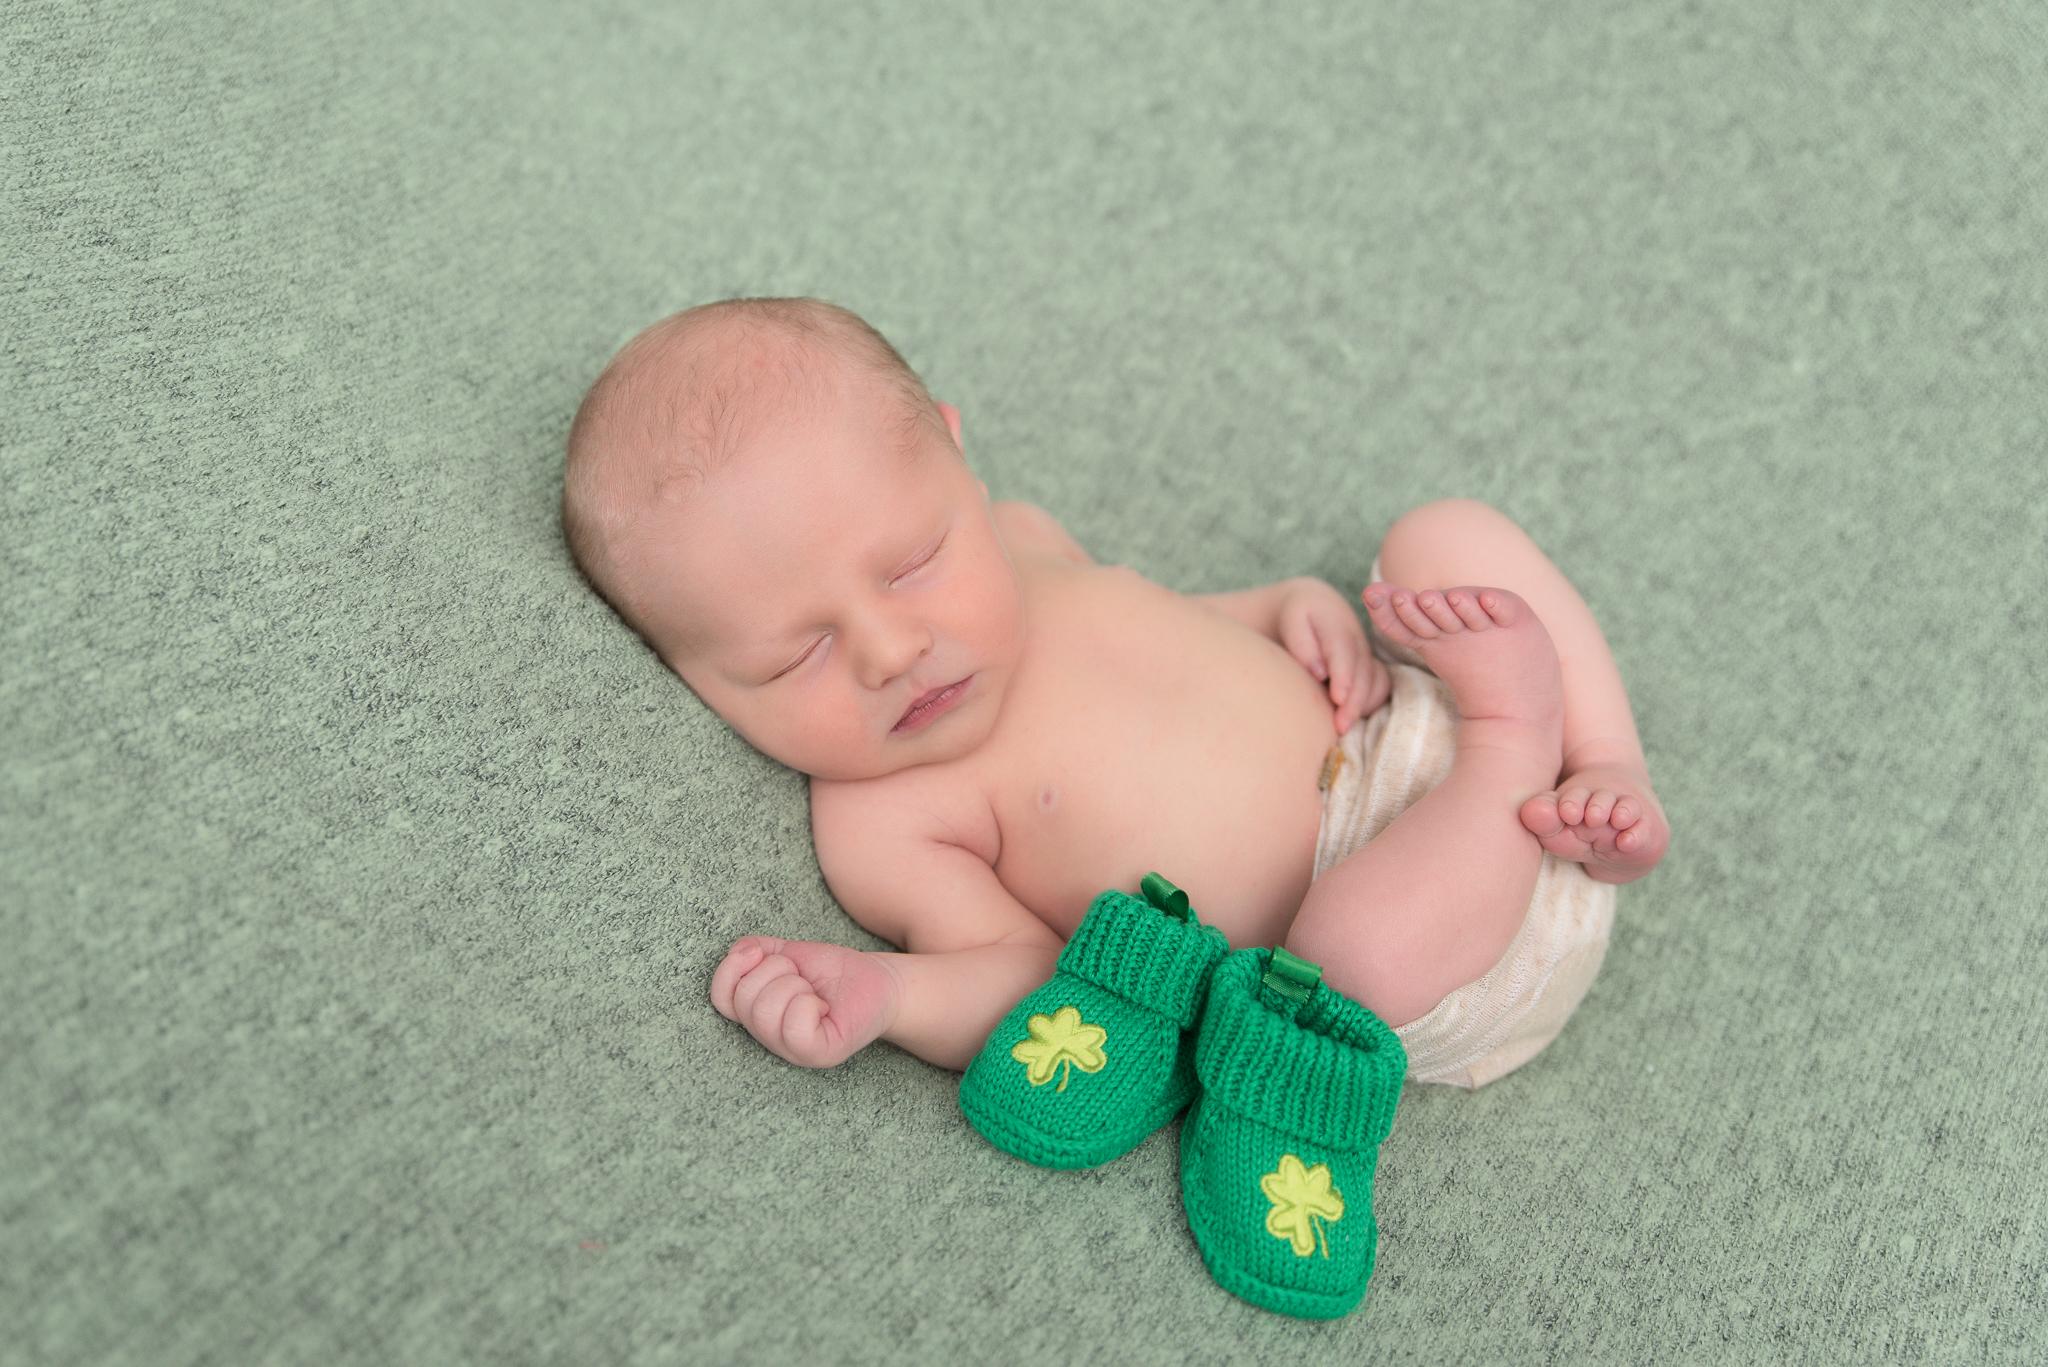 Chevy-chase-md-newborn-photographer63.jpg